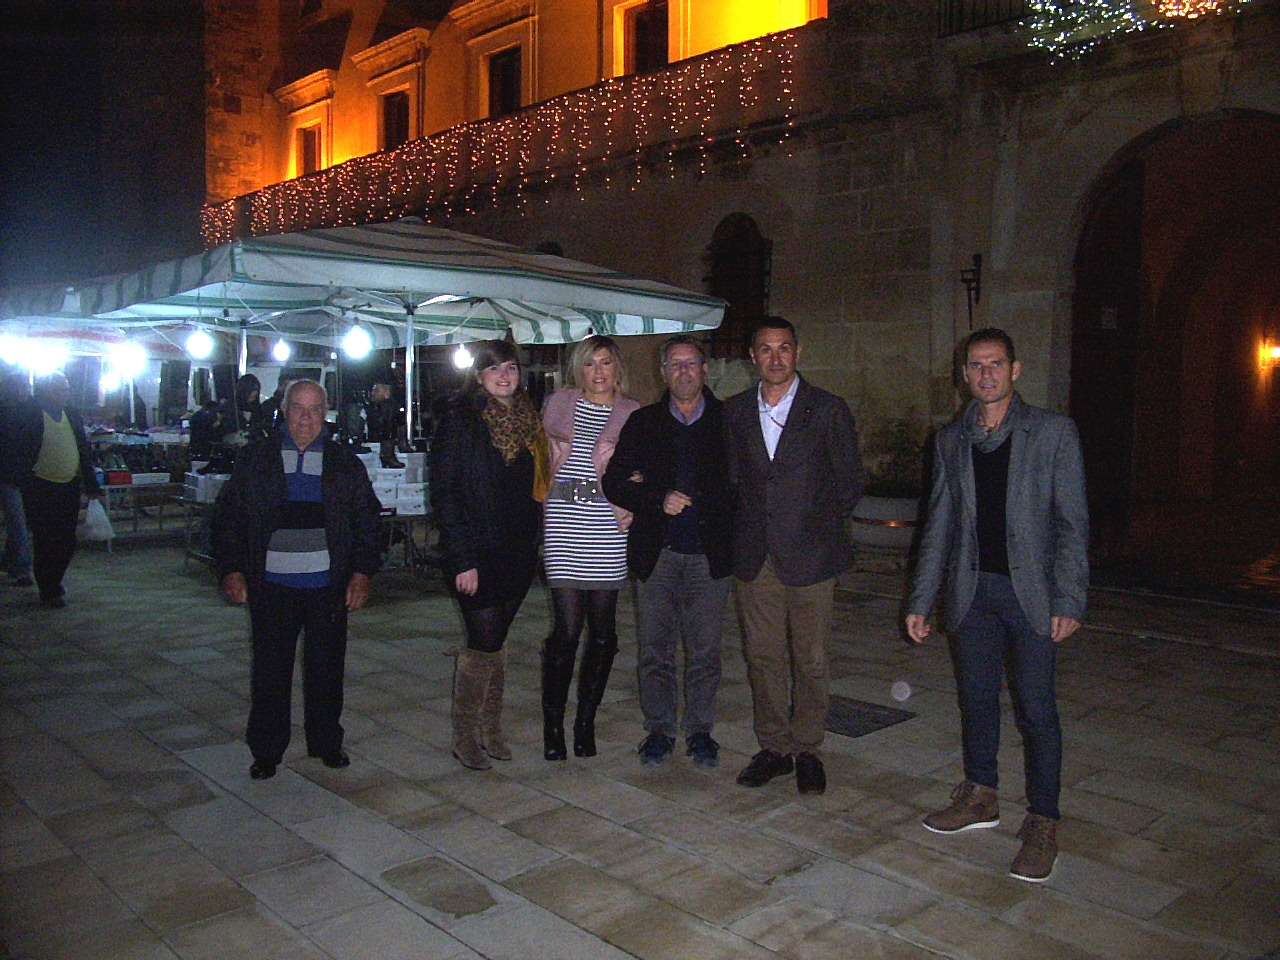 Acate. Tre consiglieri comunali e l'associazione ASA 13 regalano luminarie natalizie ed addobbi floreali.